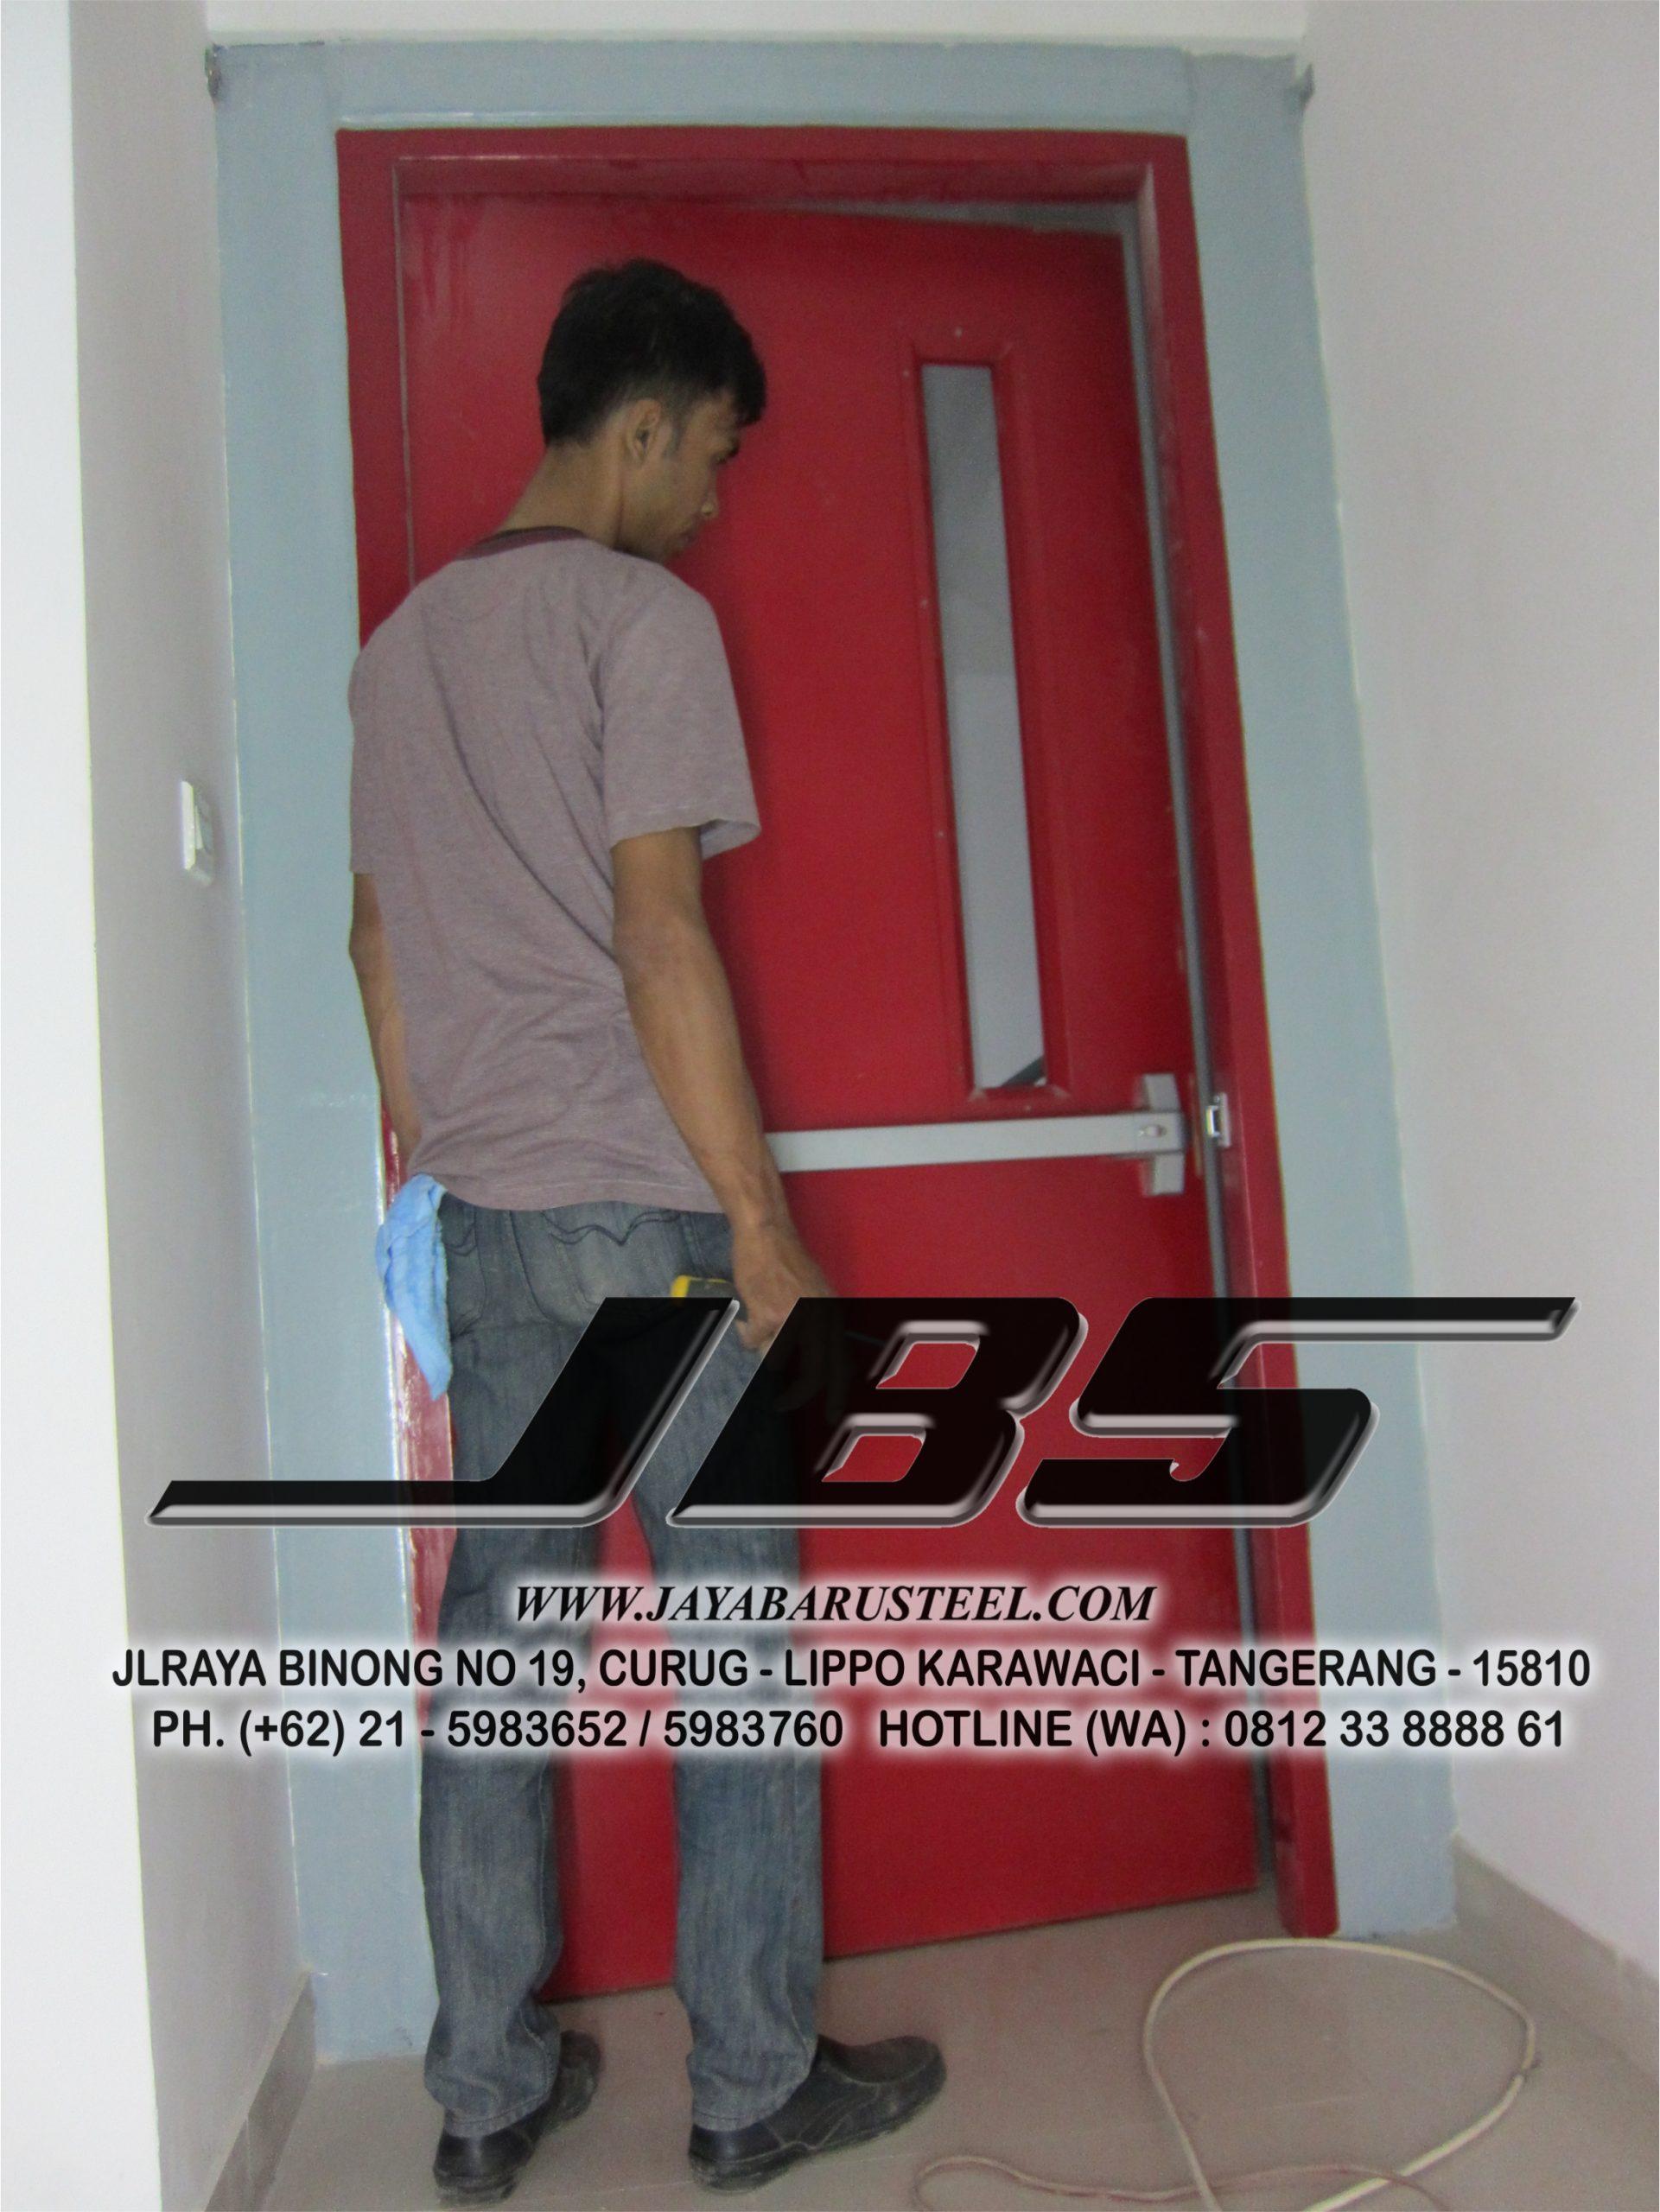 Pintu Garasi Solo, HOTLINE 081-233-8888-61